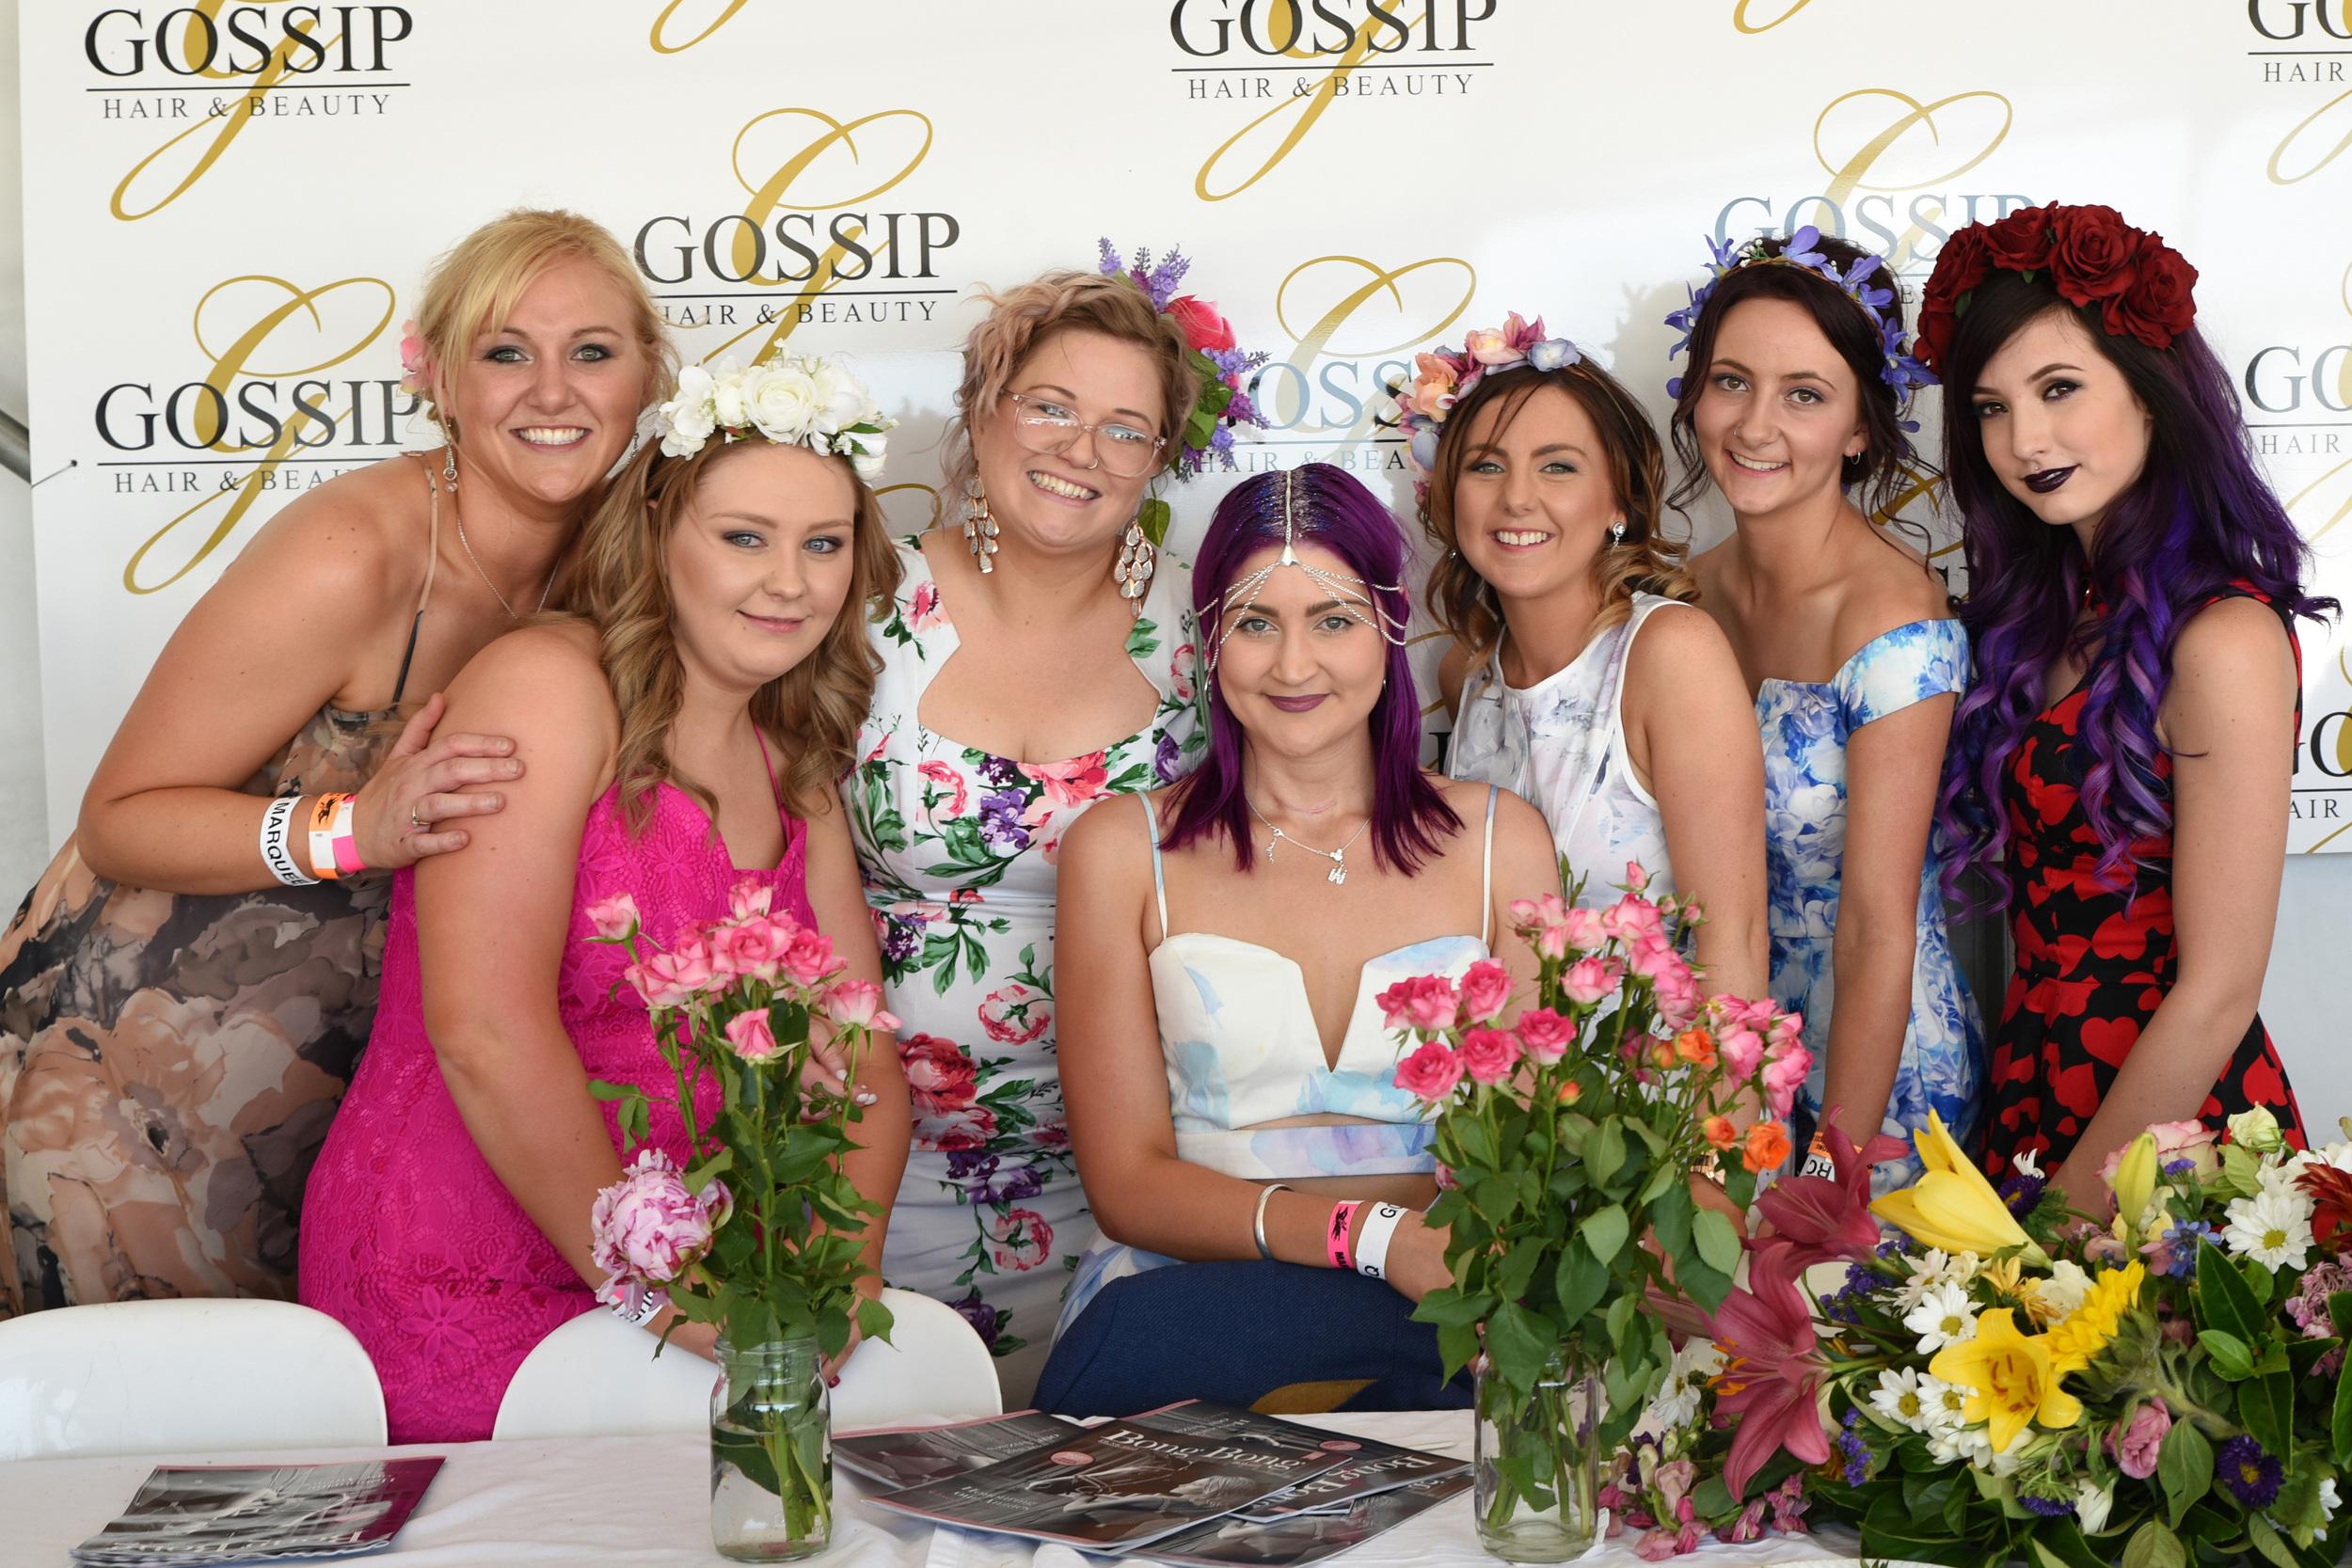 gossip girls5.jpg